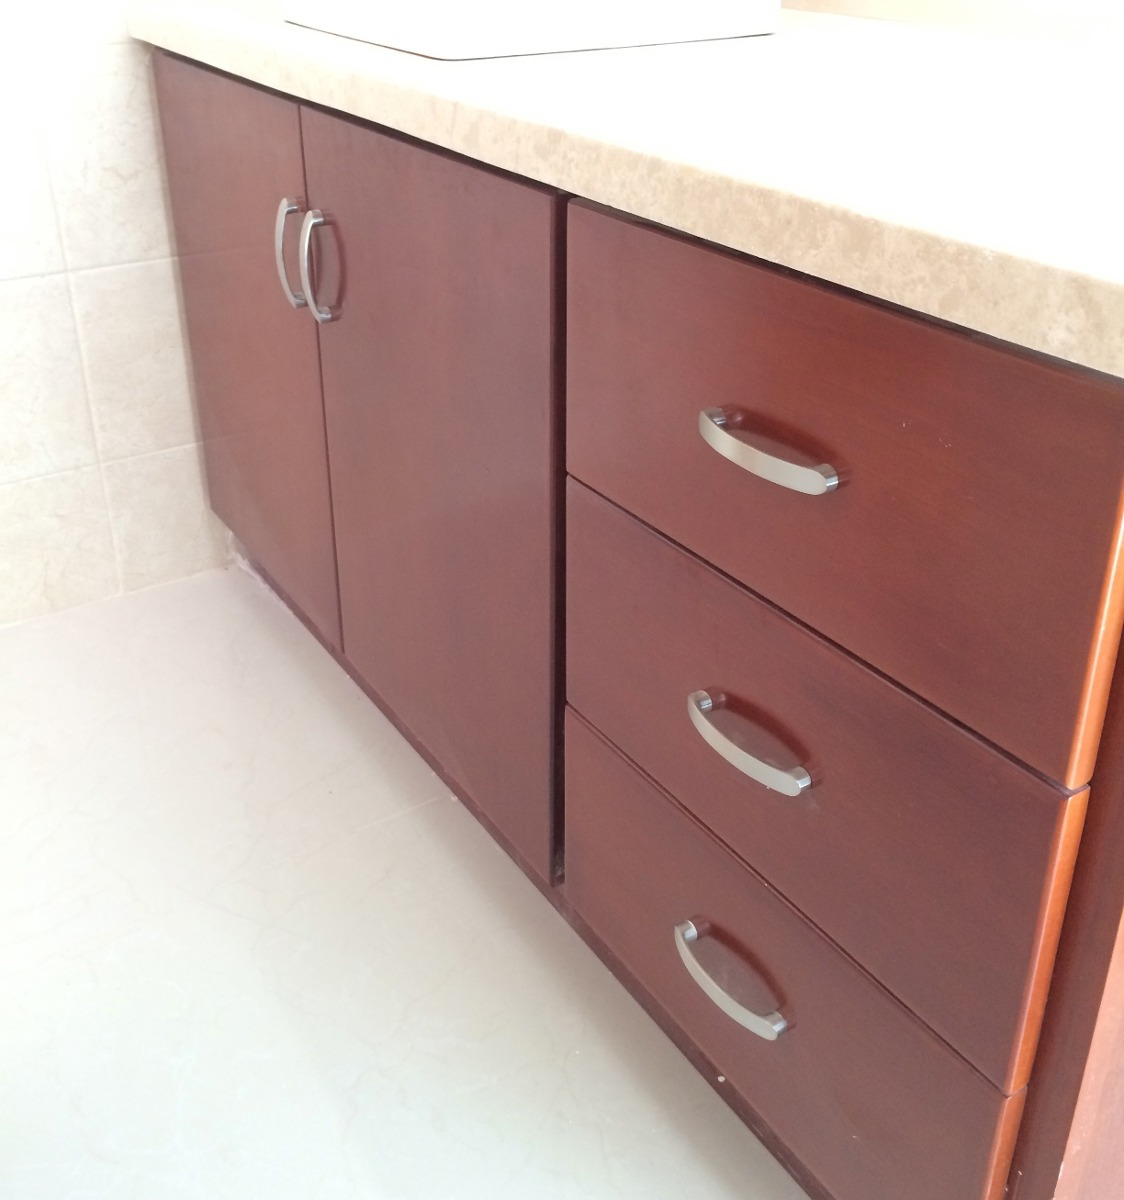 Jaladeras economicas para closet o cocina en - Pomos para puertas de cocina ...